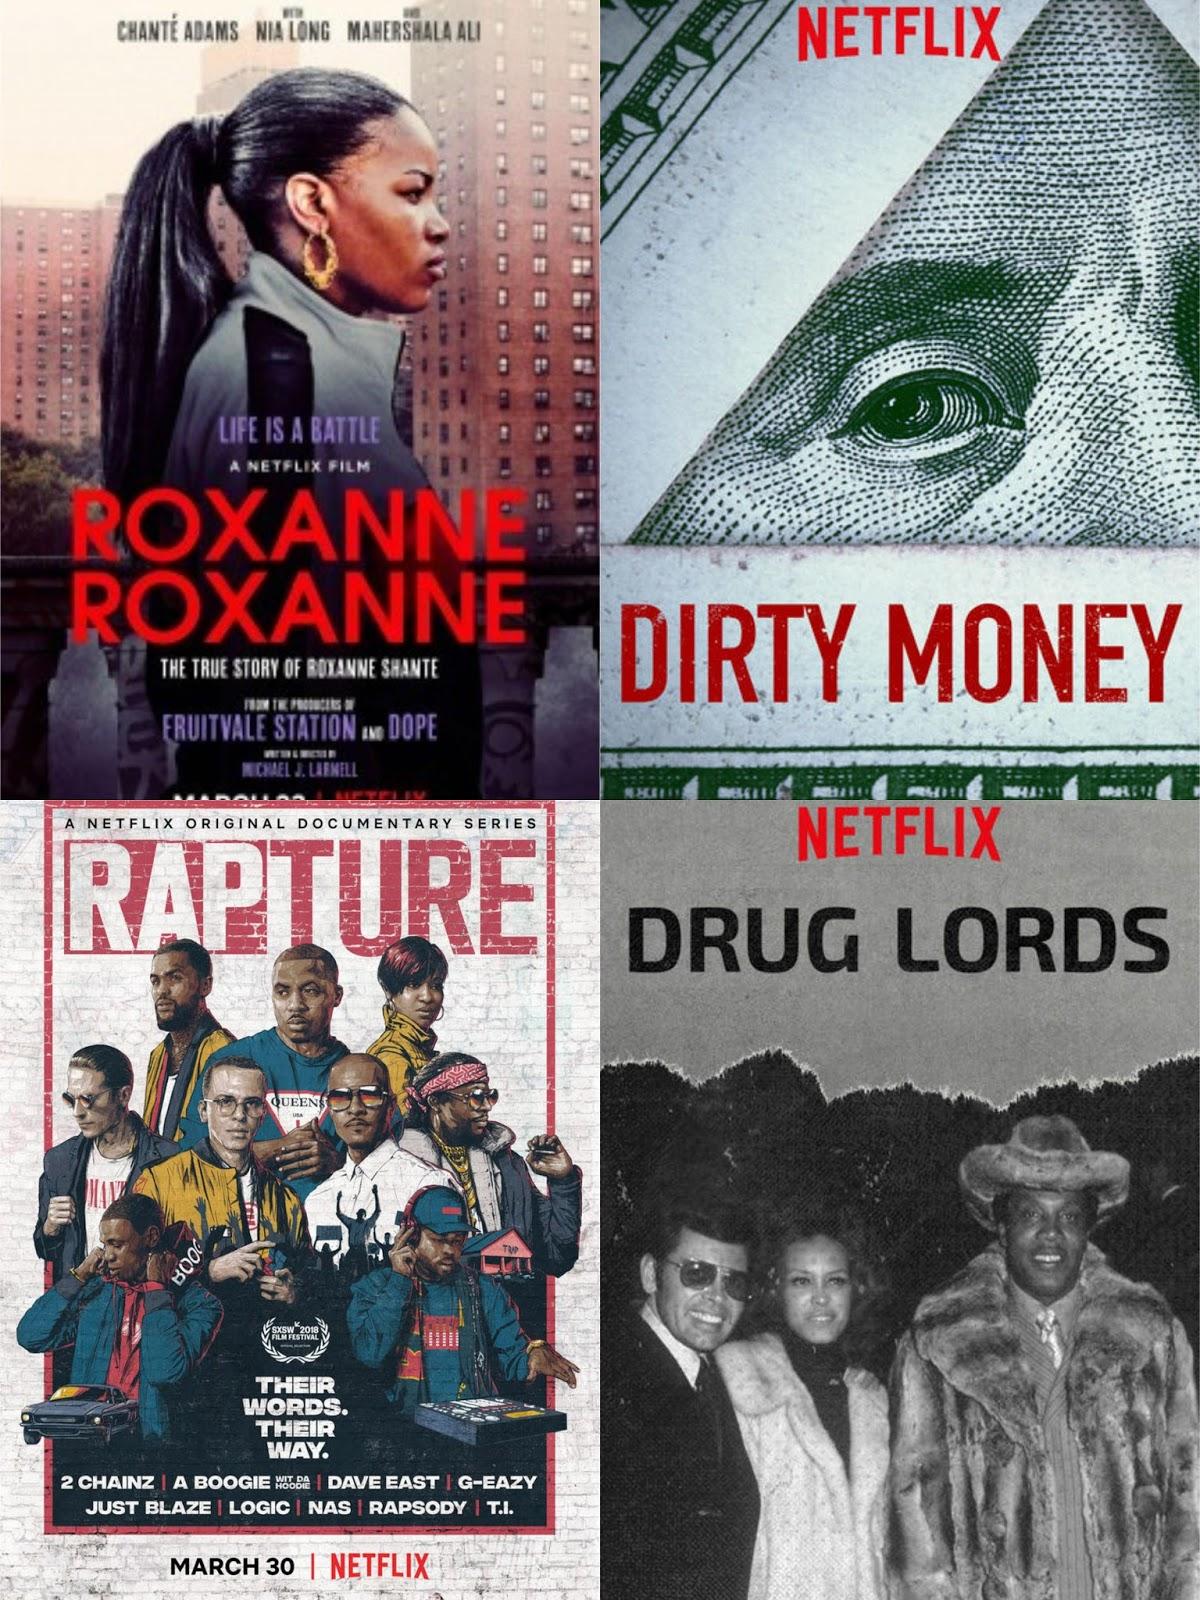 DAR TV: 7 Netflix Originals To Watch - DefineARevolution com